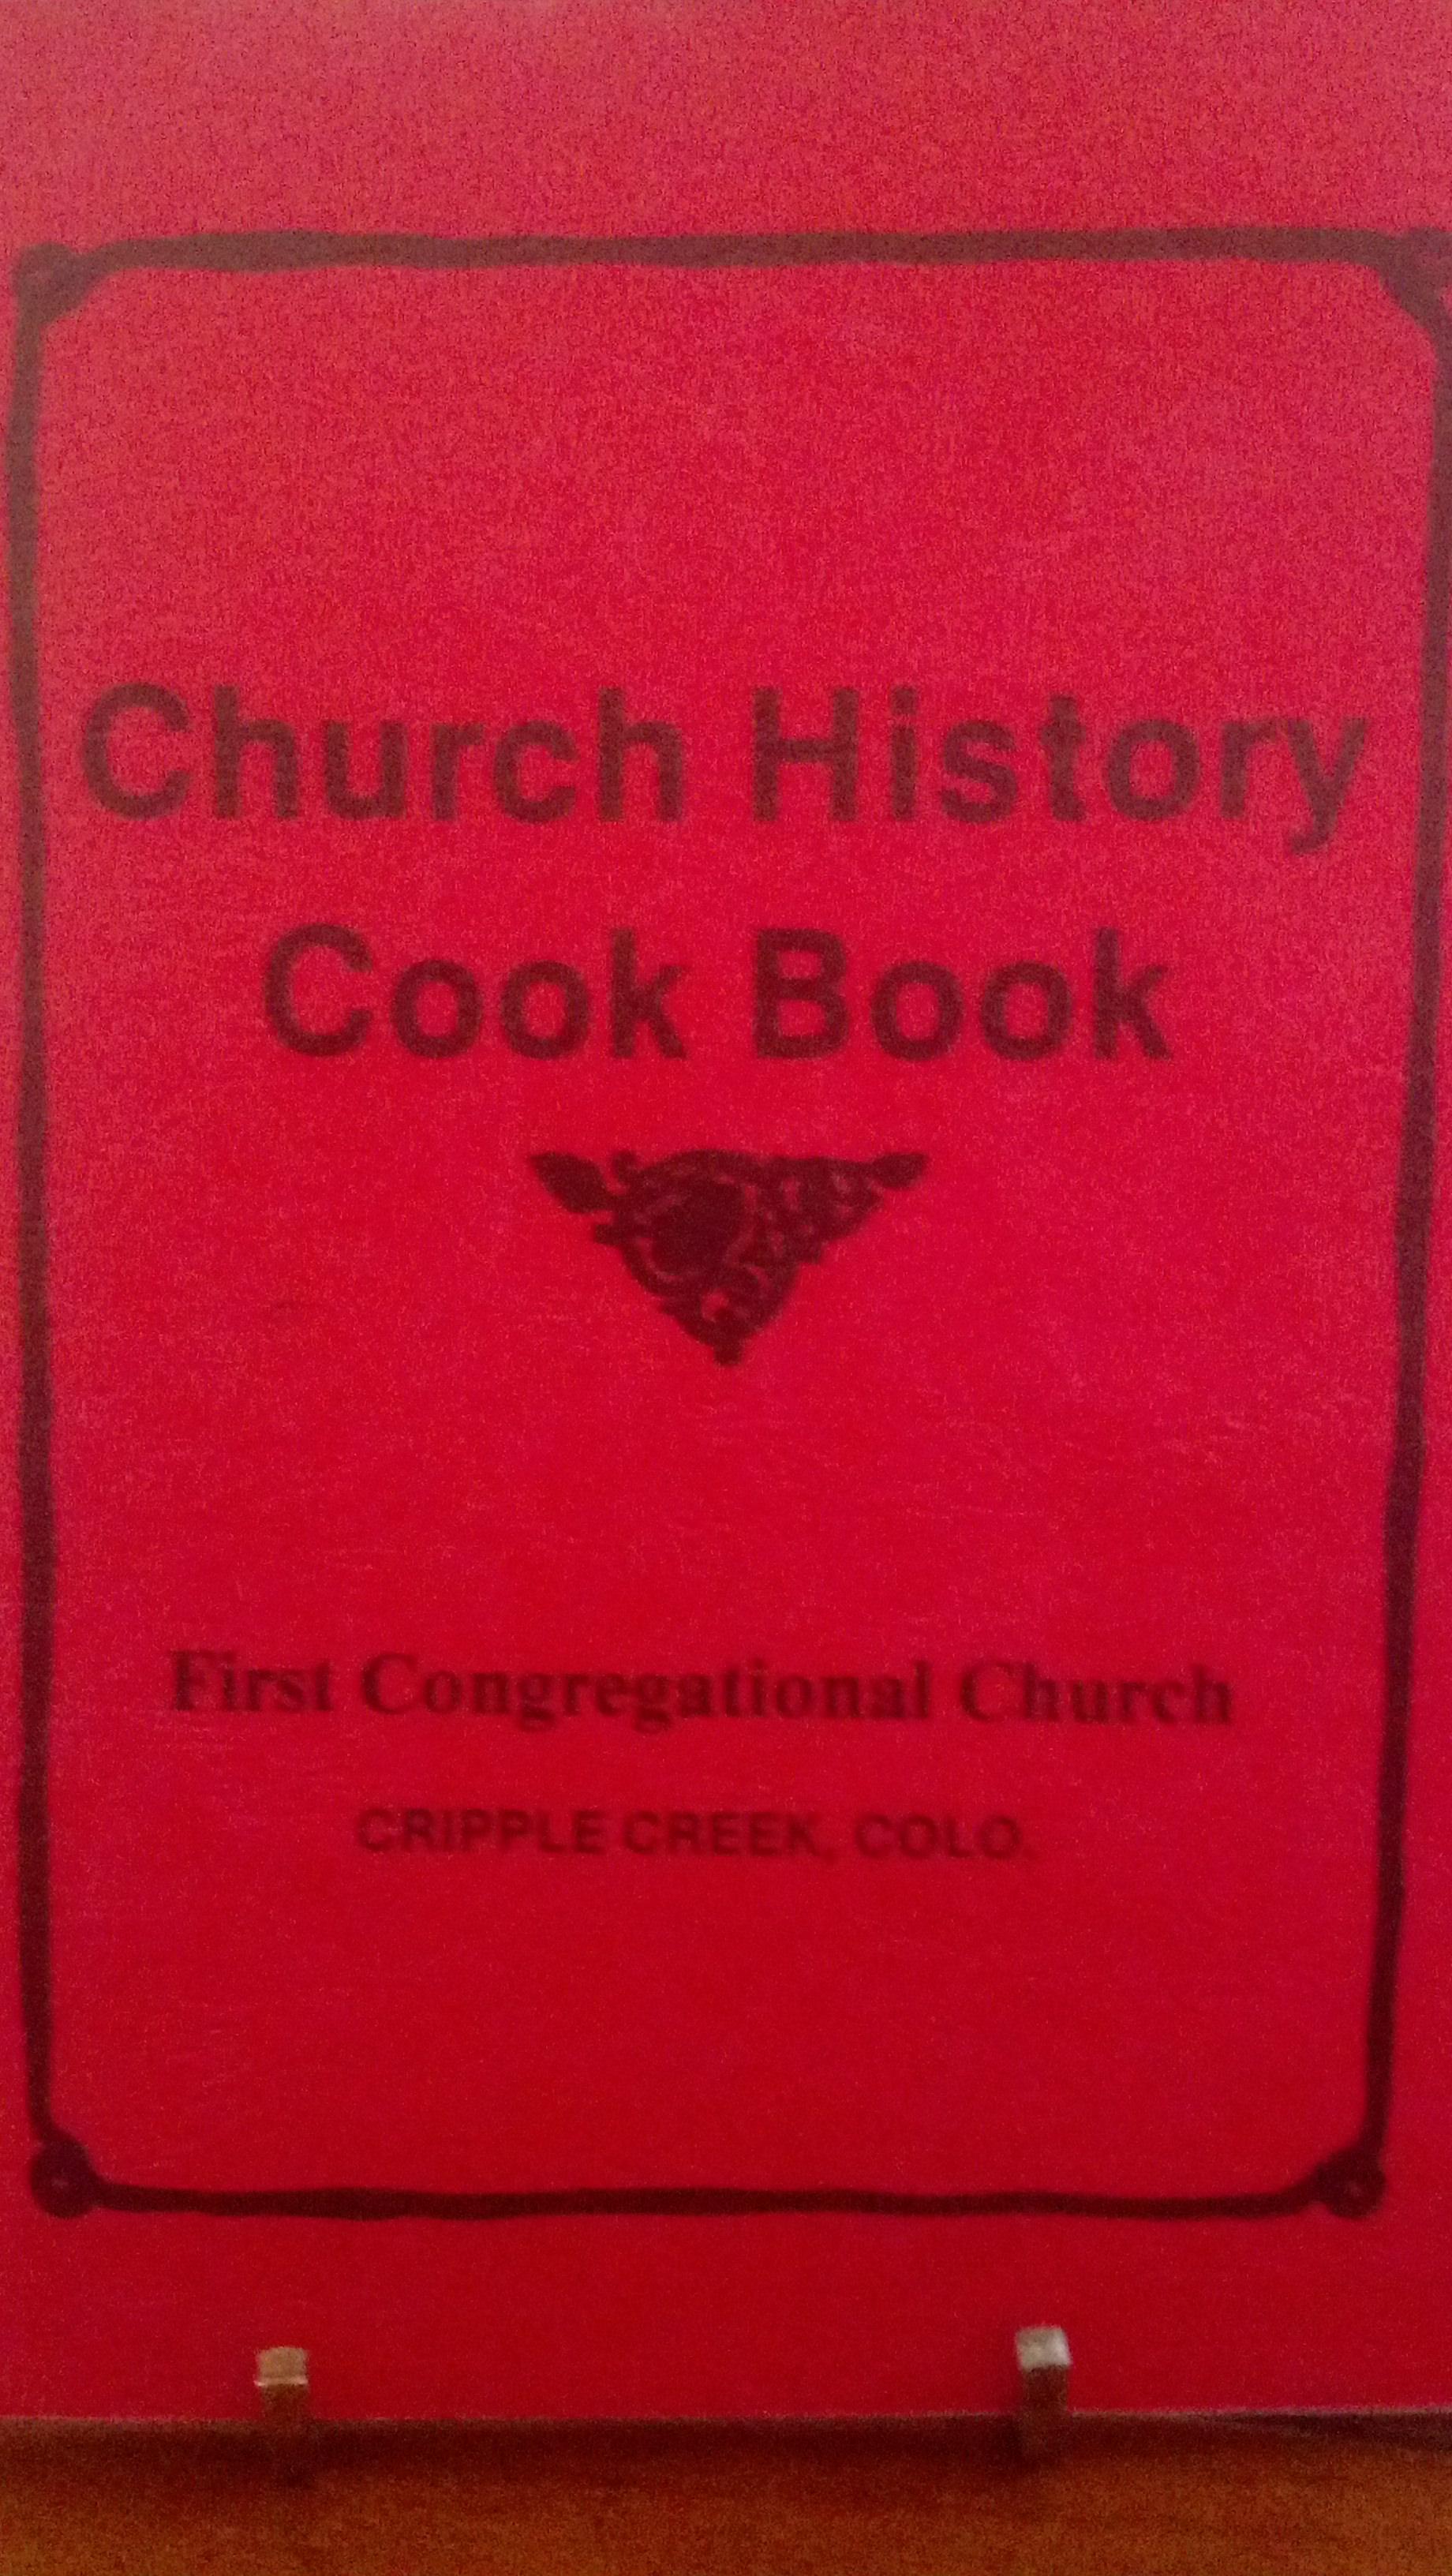 Cripple Creek Church History Cook Book